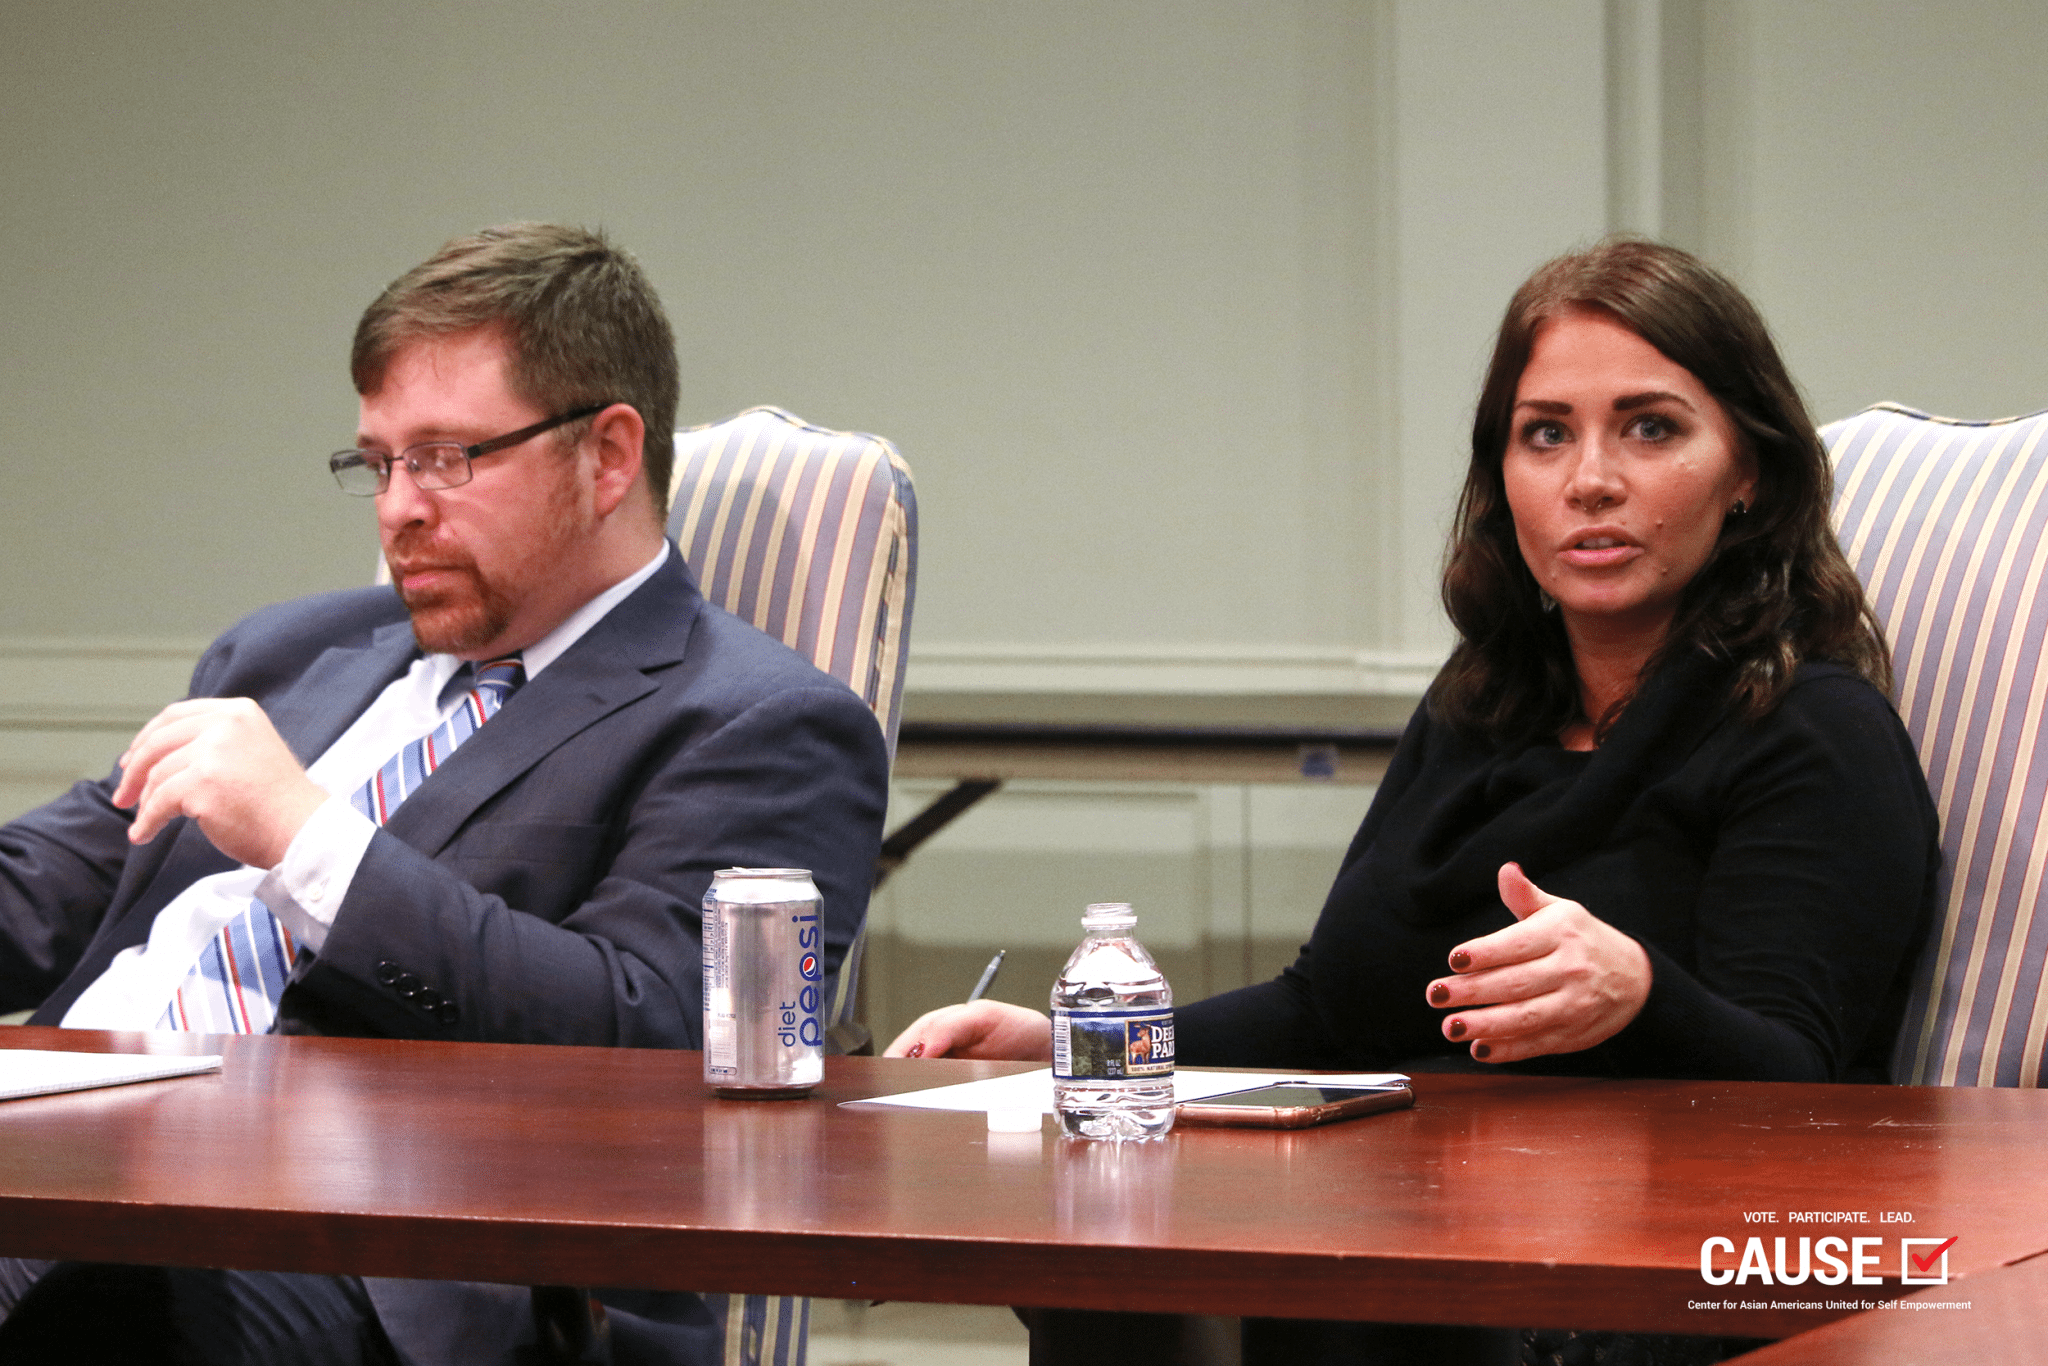 Ken Wiseman and Kayda Keleher